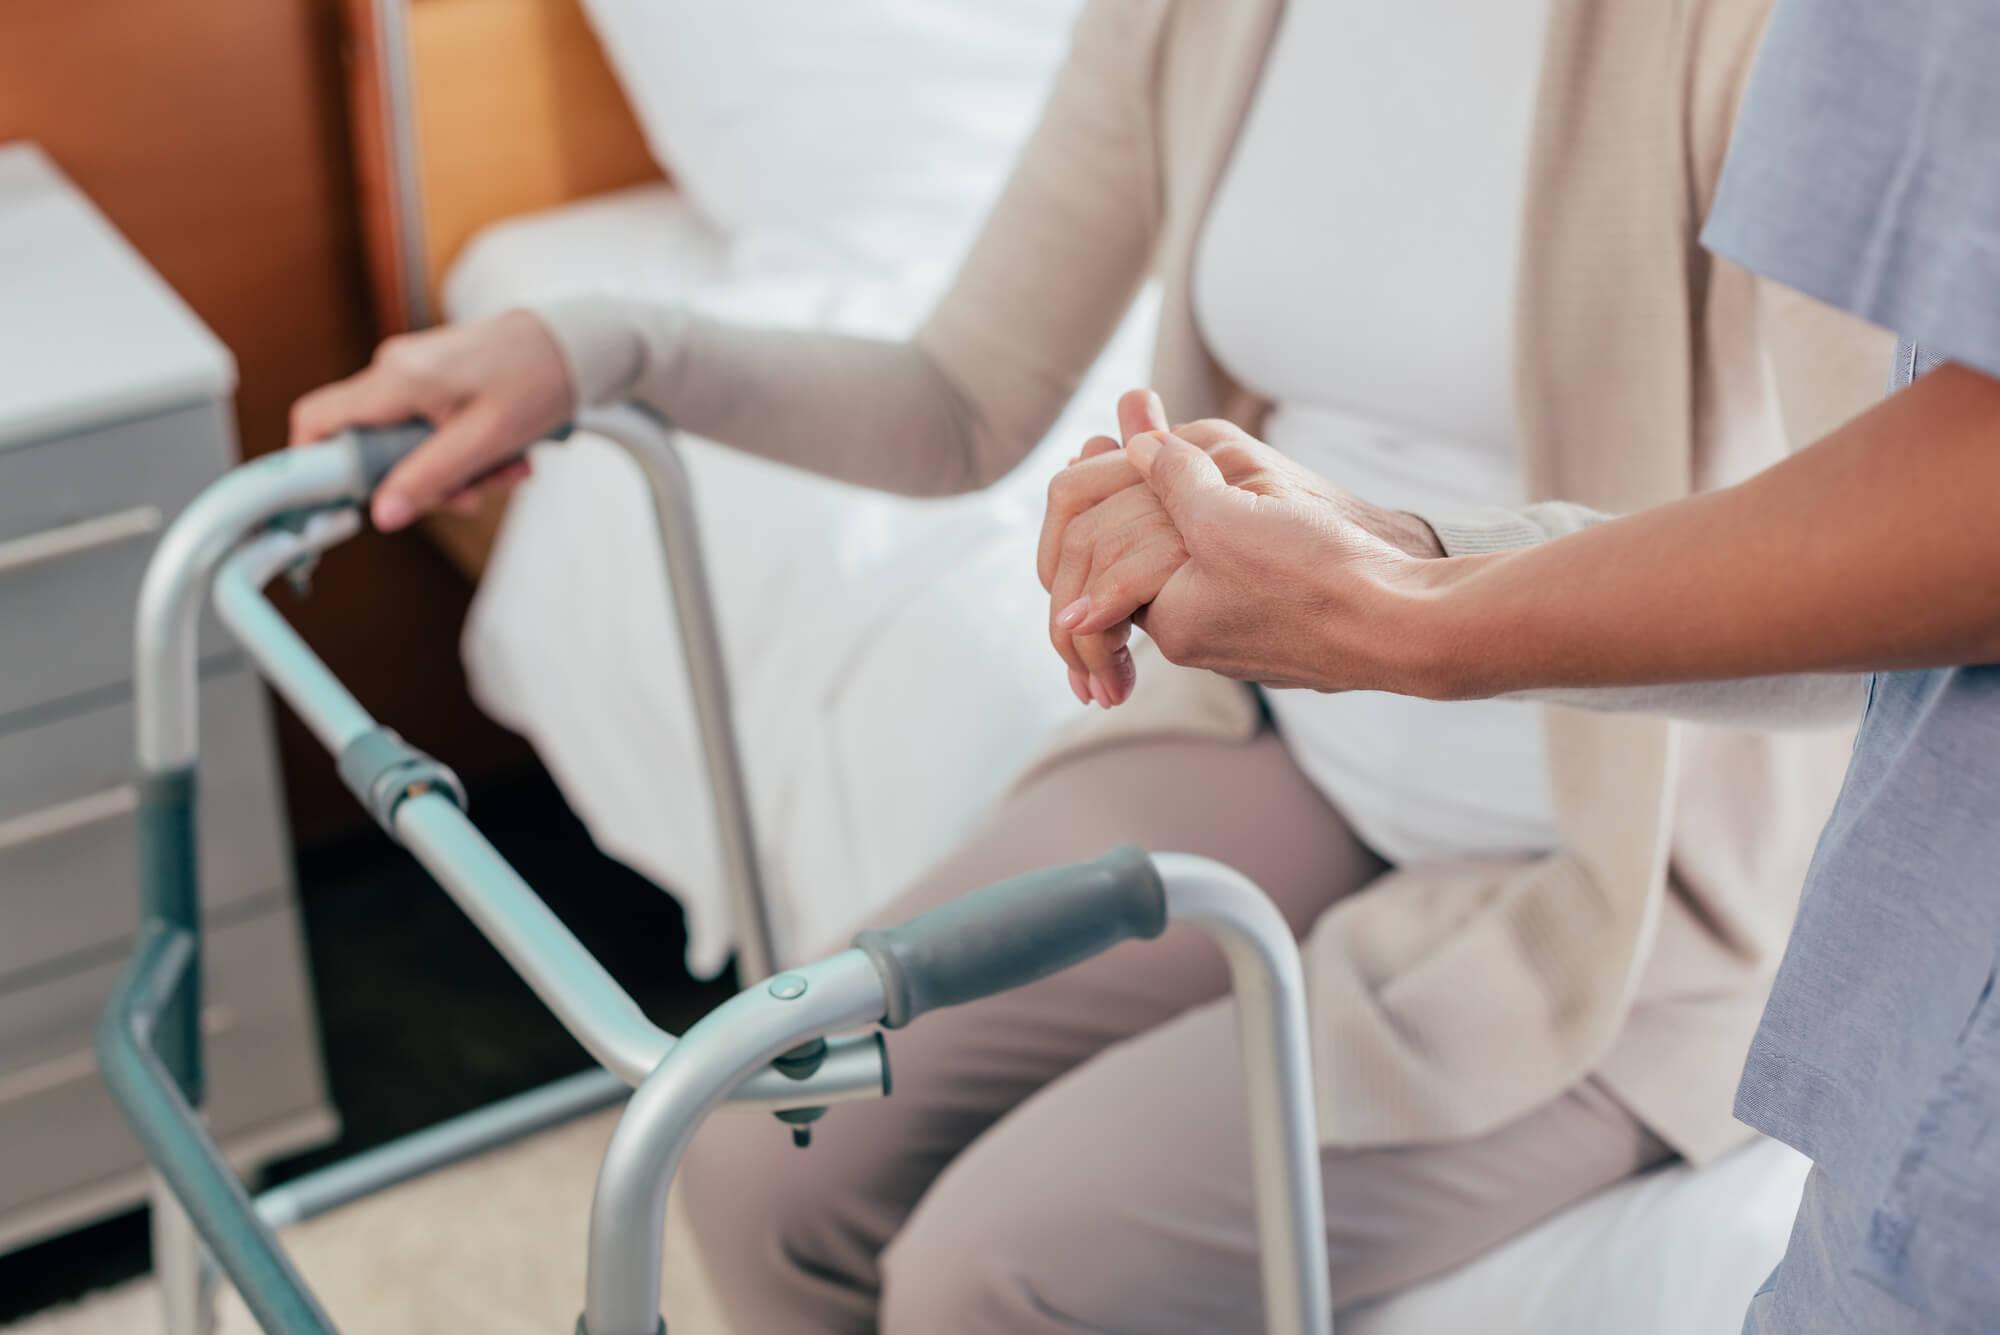 Schrödinger Nursing: A Look Inside